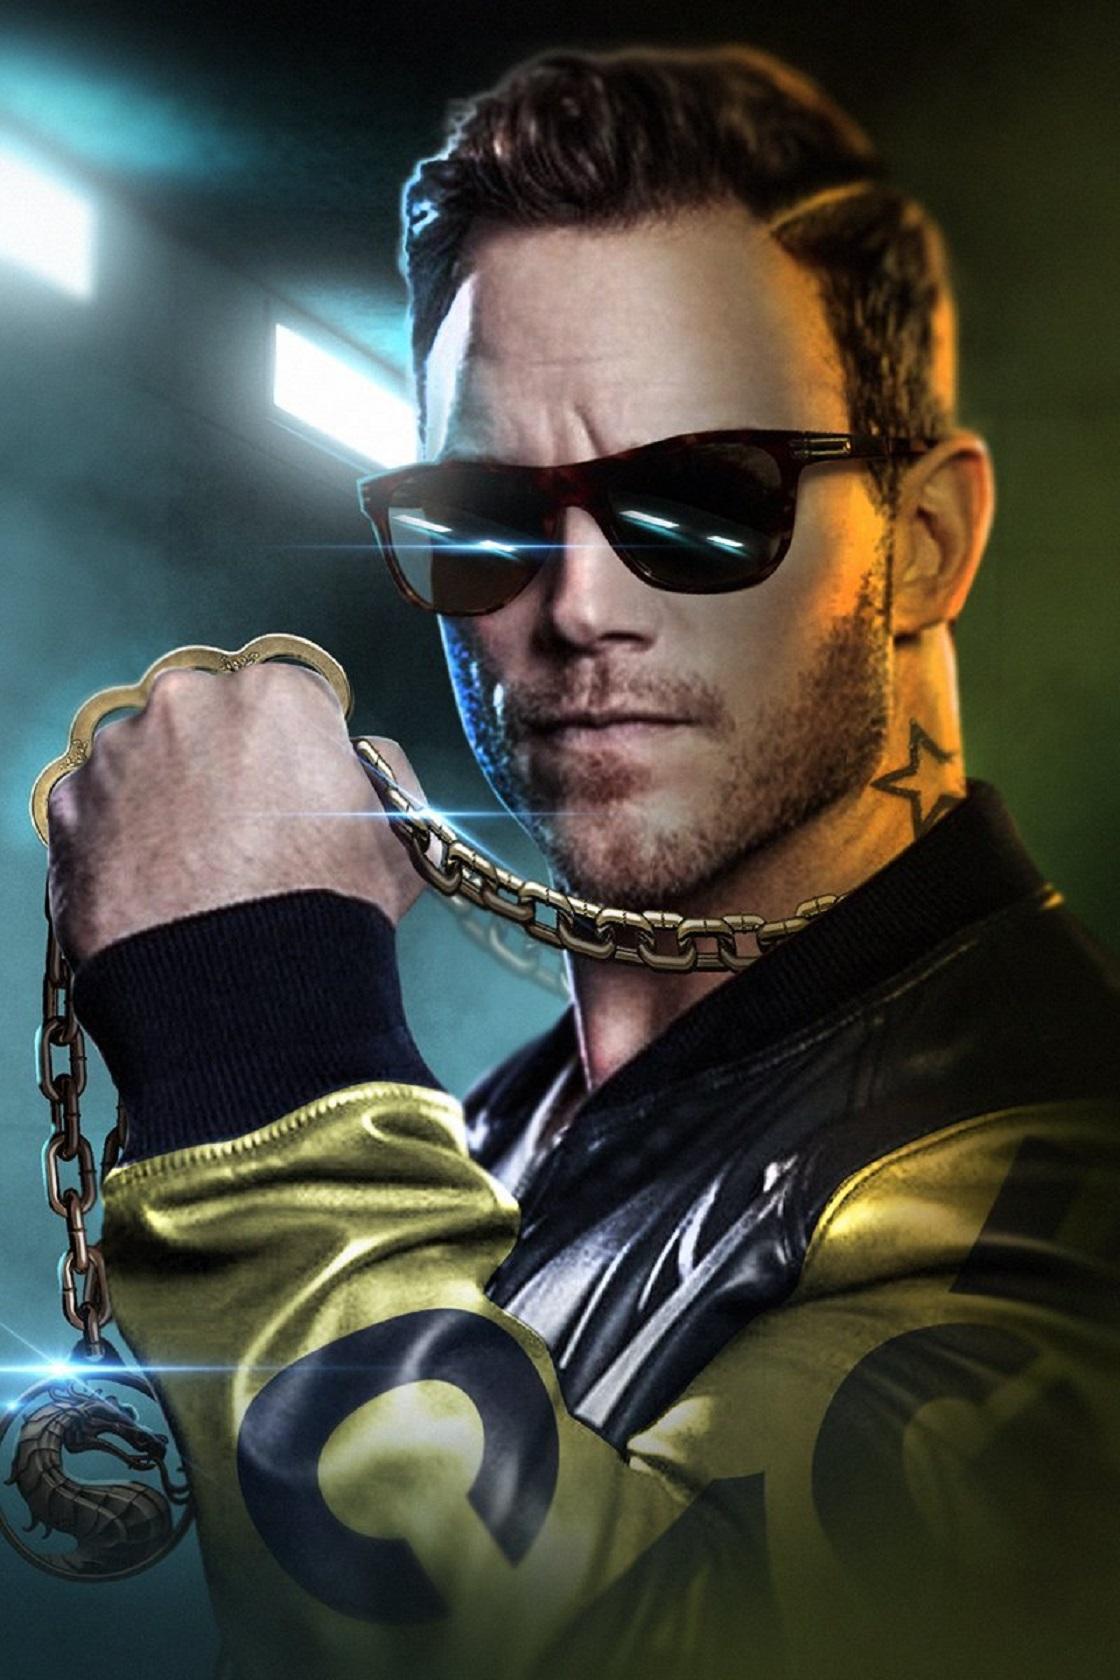 Ilustraciones del elenco de Mortal Kombat - BossLogic